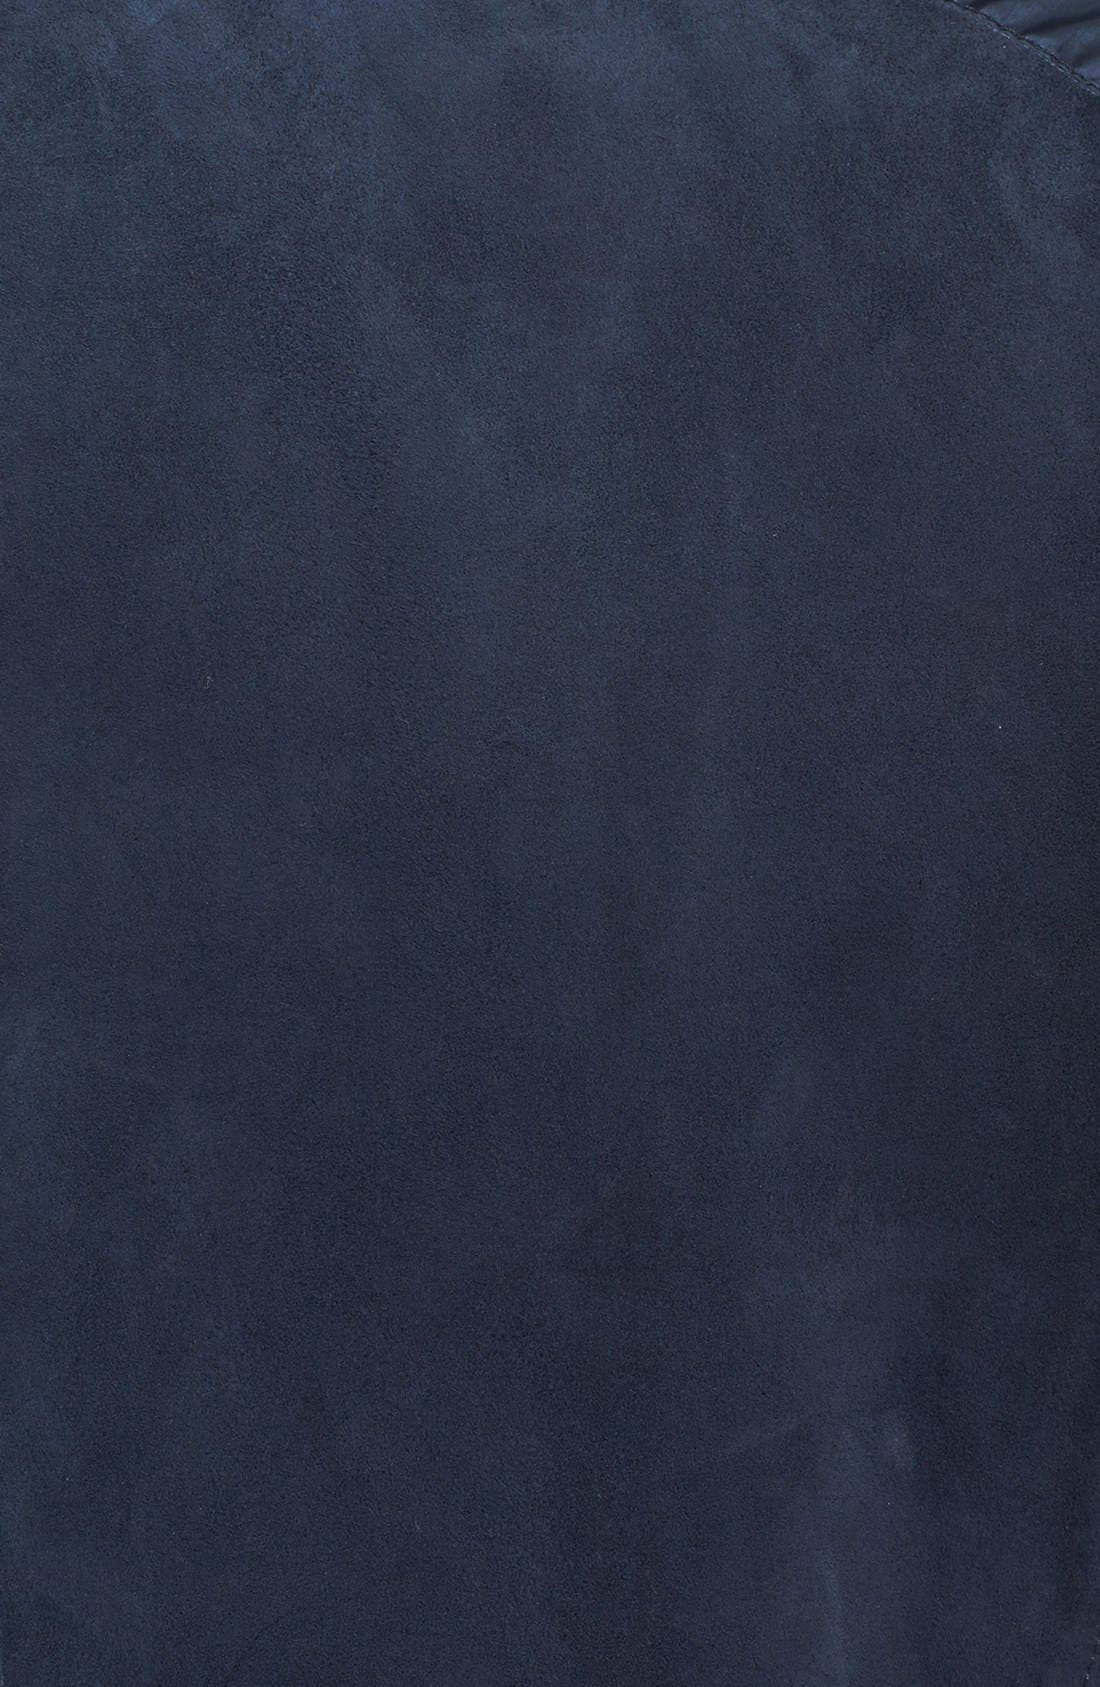 Alternate Image 3  - Michael Kors Mixed Media Jacket